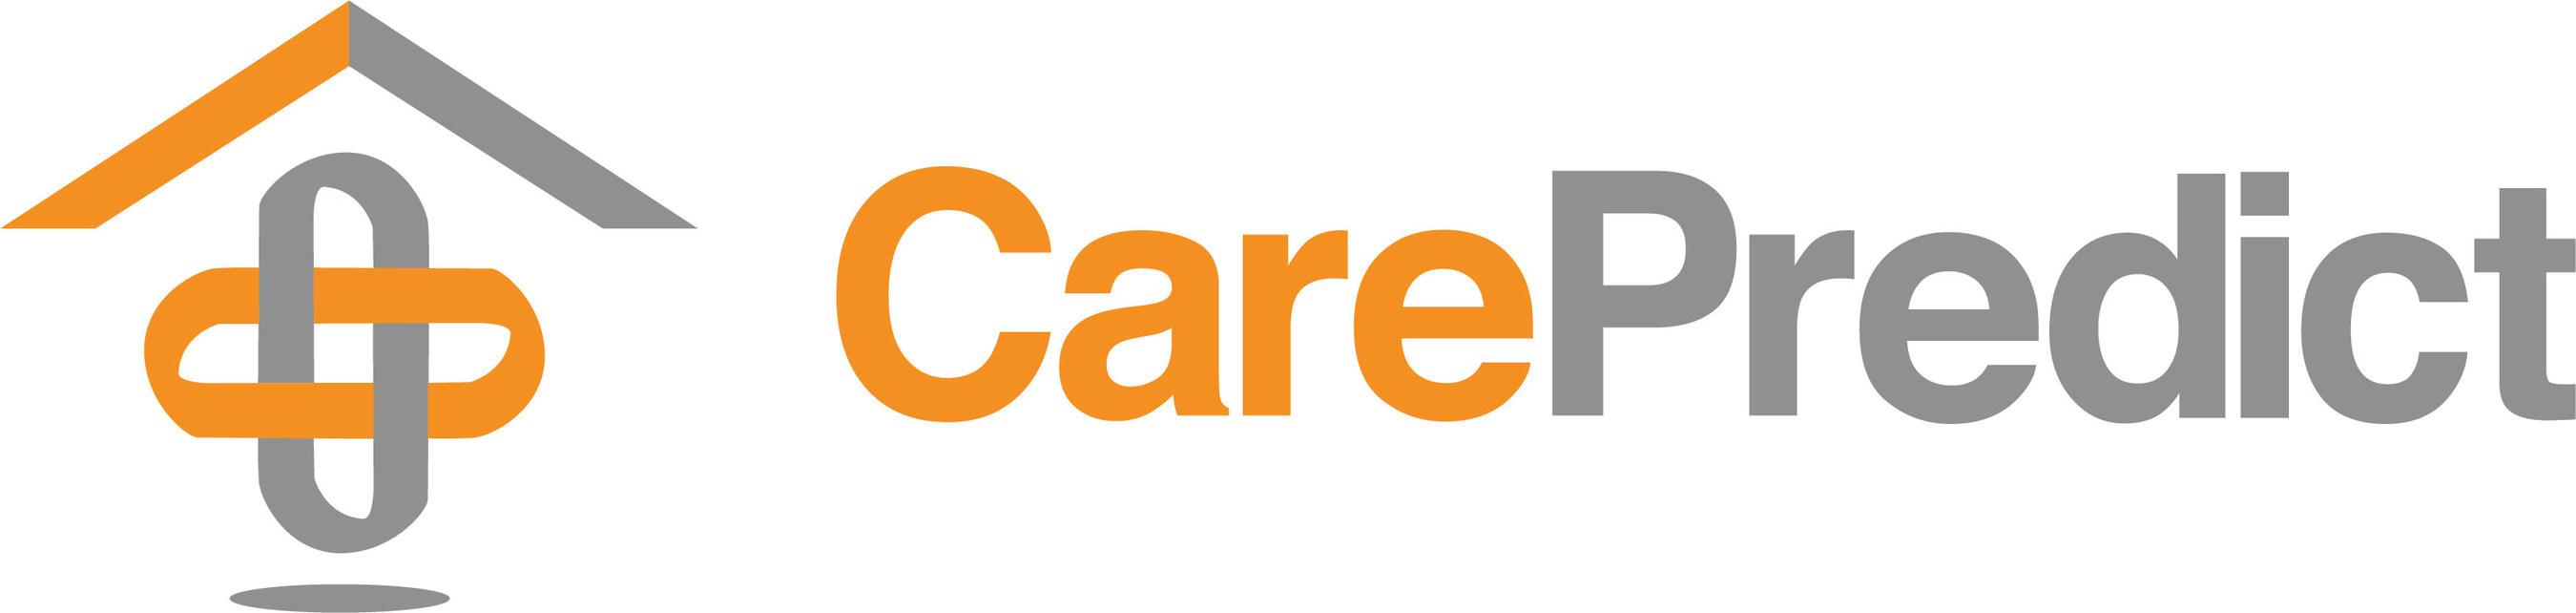 (PRNewsfoto/CarePredict)